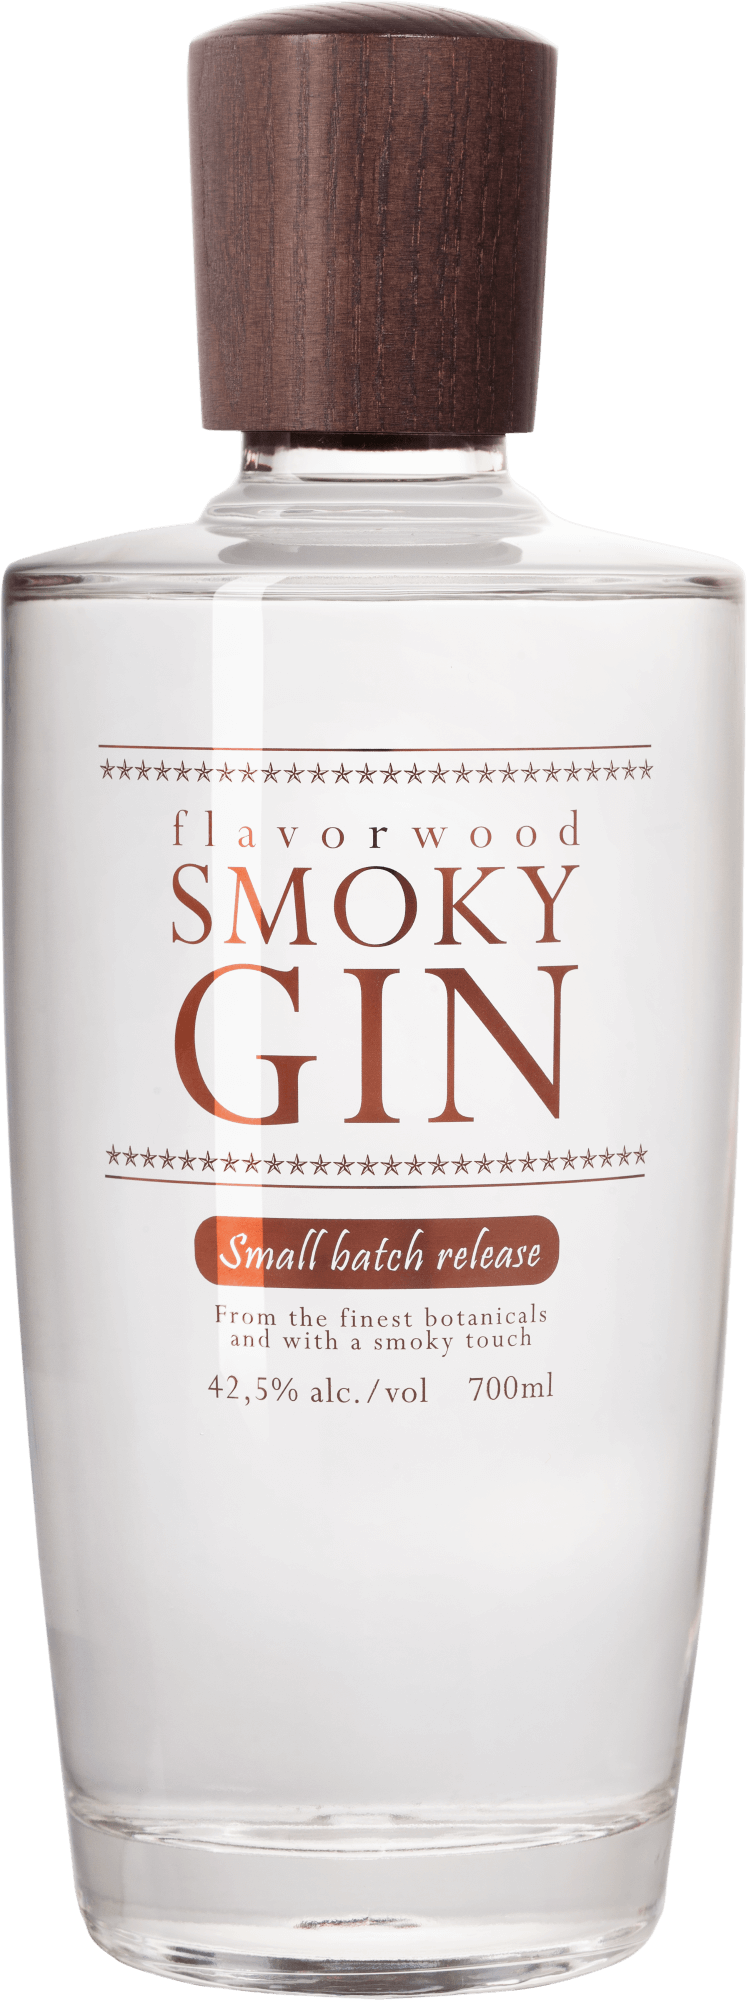 Flavorwood Smoky Gin